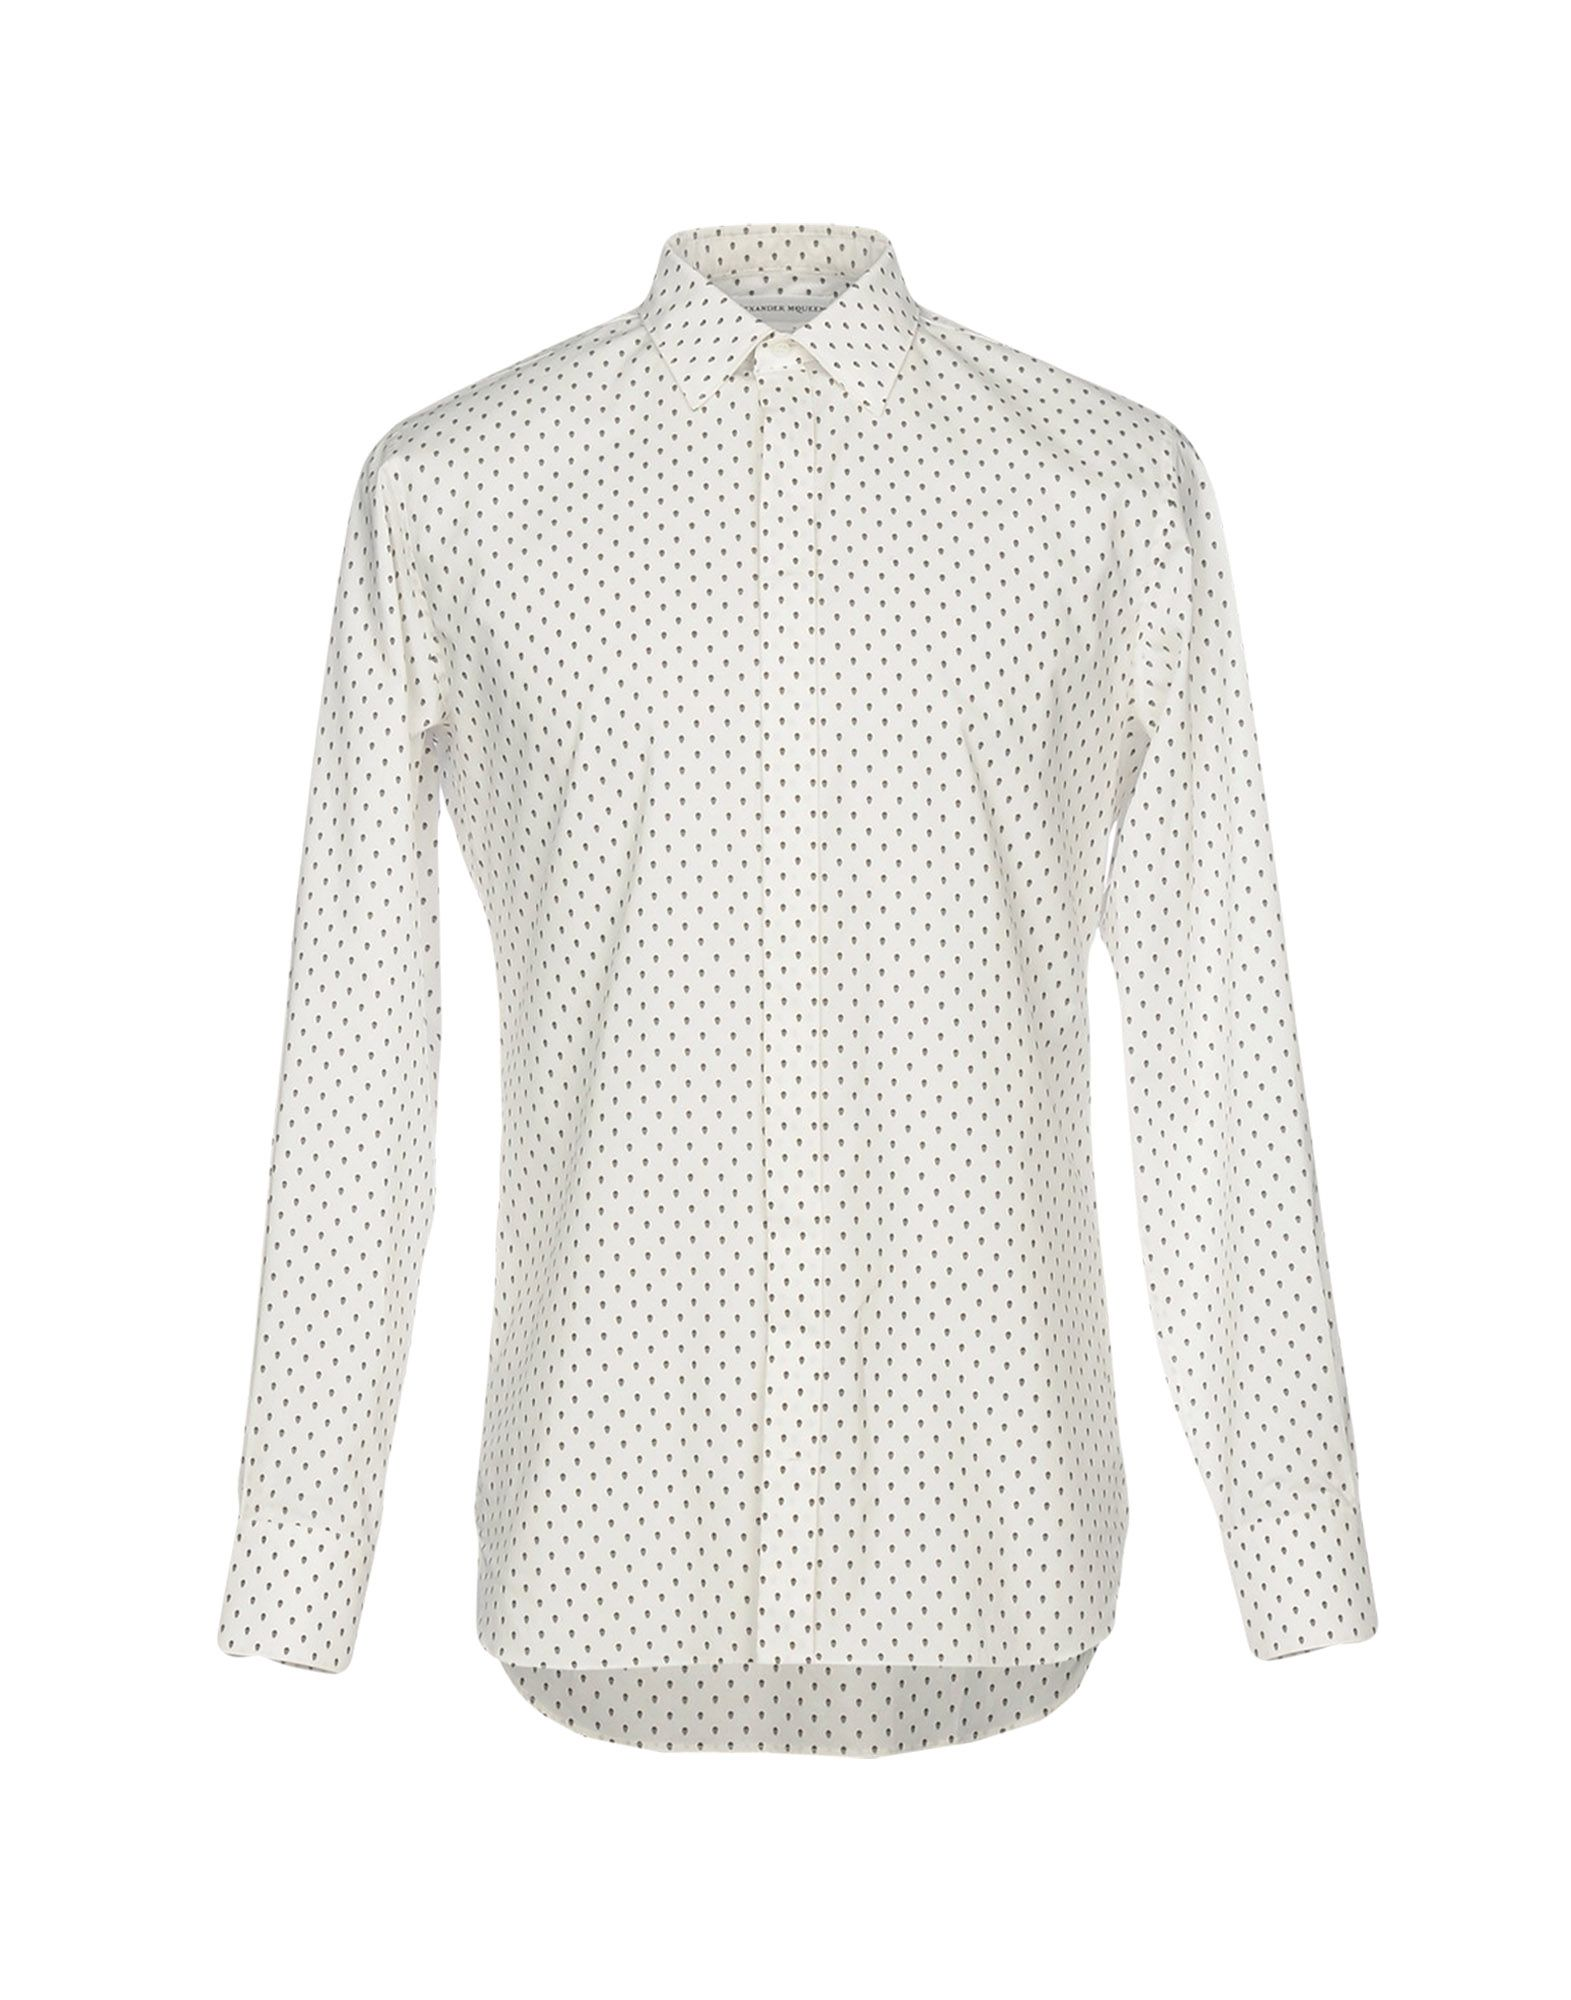 Camicia Fantasia Alexander Mcqueen Uomo - Acquista online su